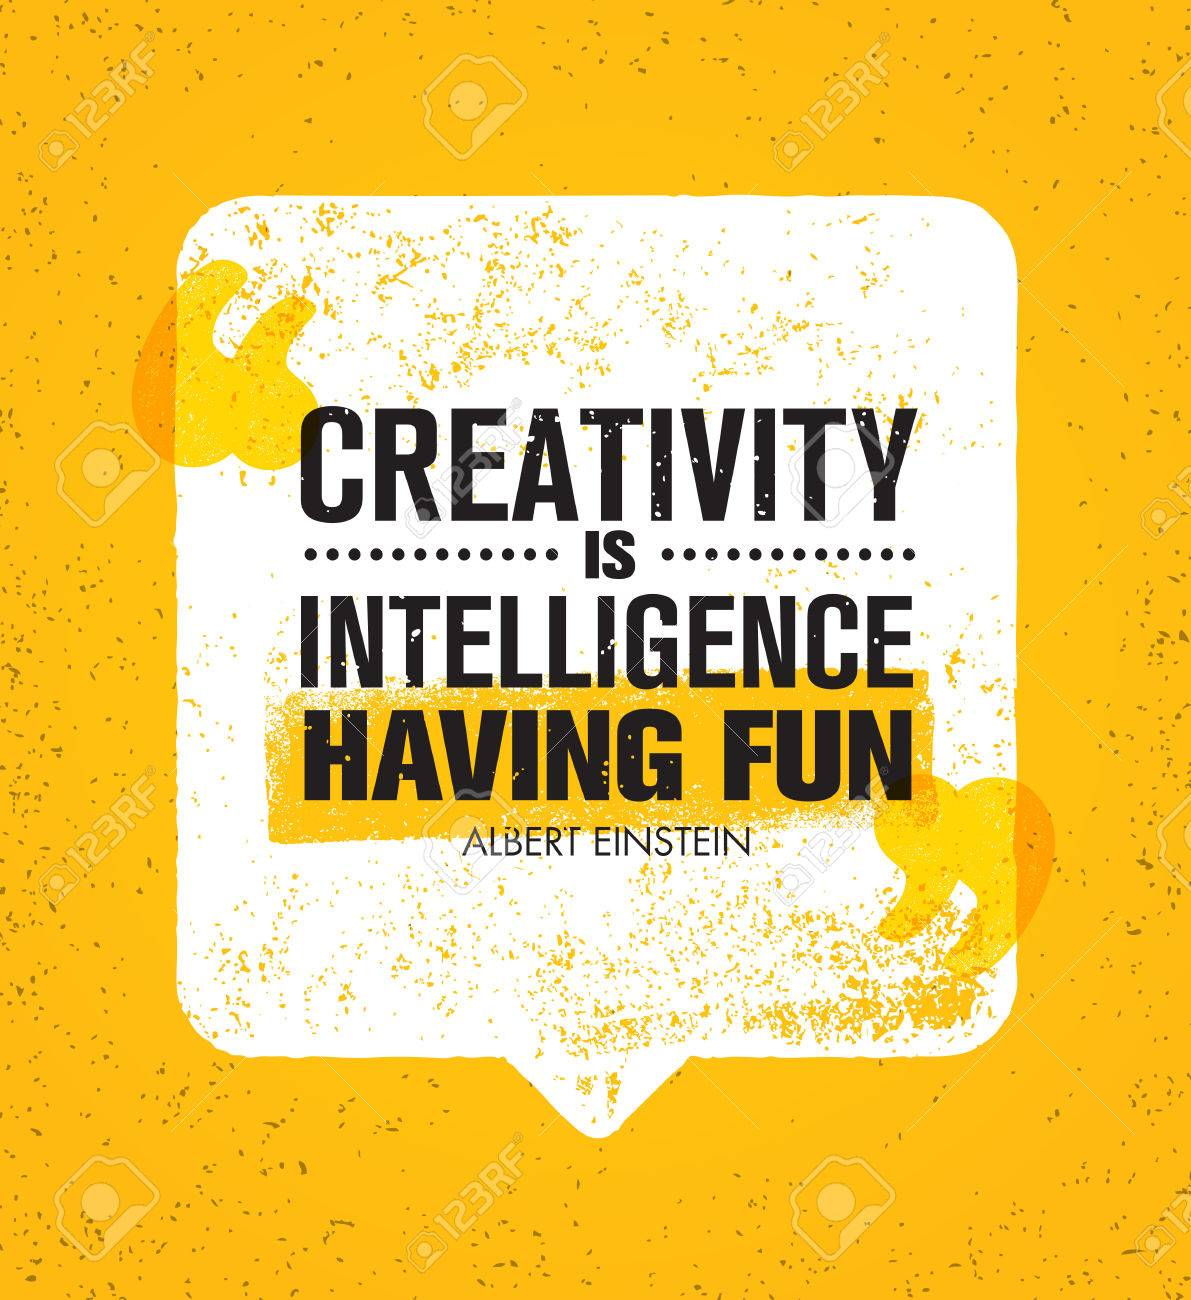 Creativity Is Intelligence Having Fun. Inspiring Creative Motivation Quote. Vector Speech Bubble Banner Design Concept - 71455106